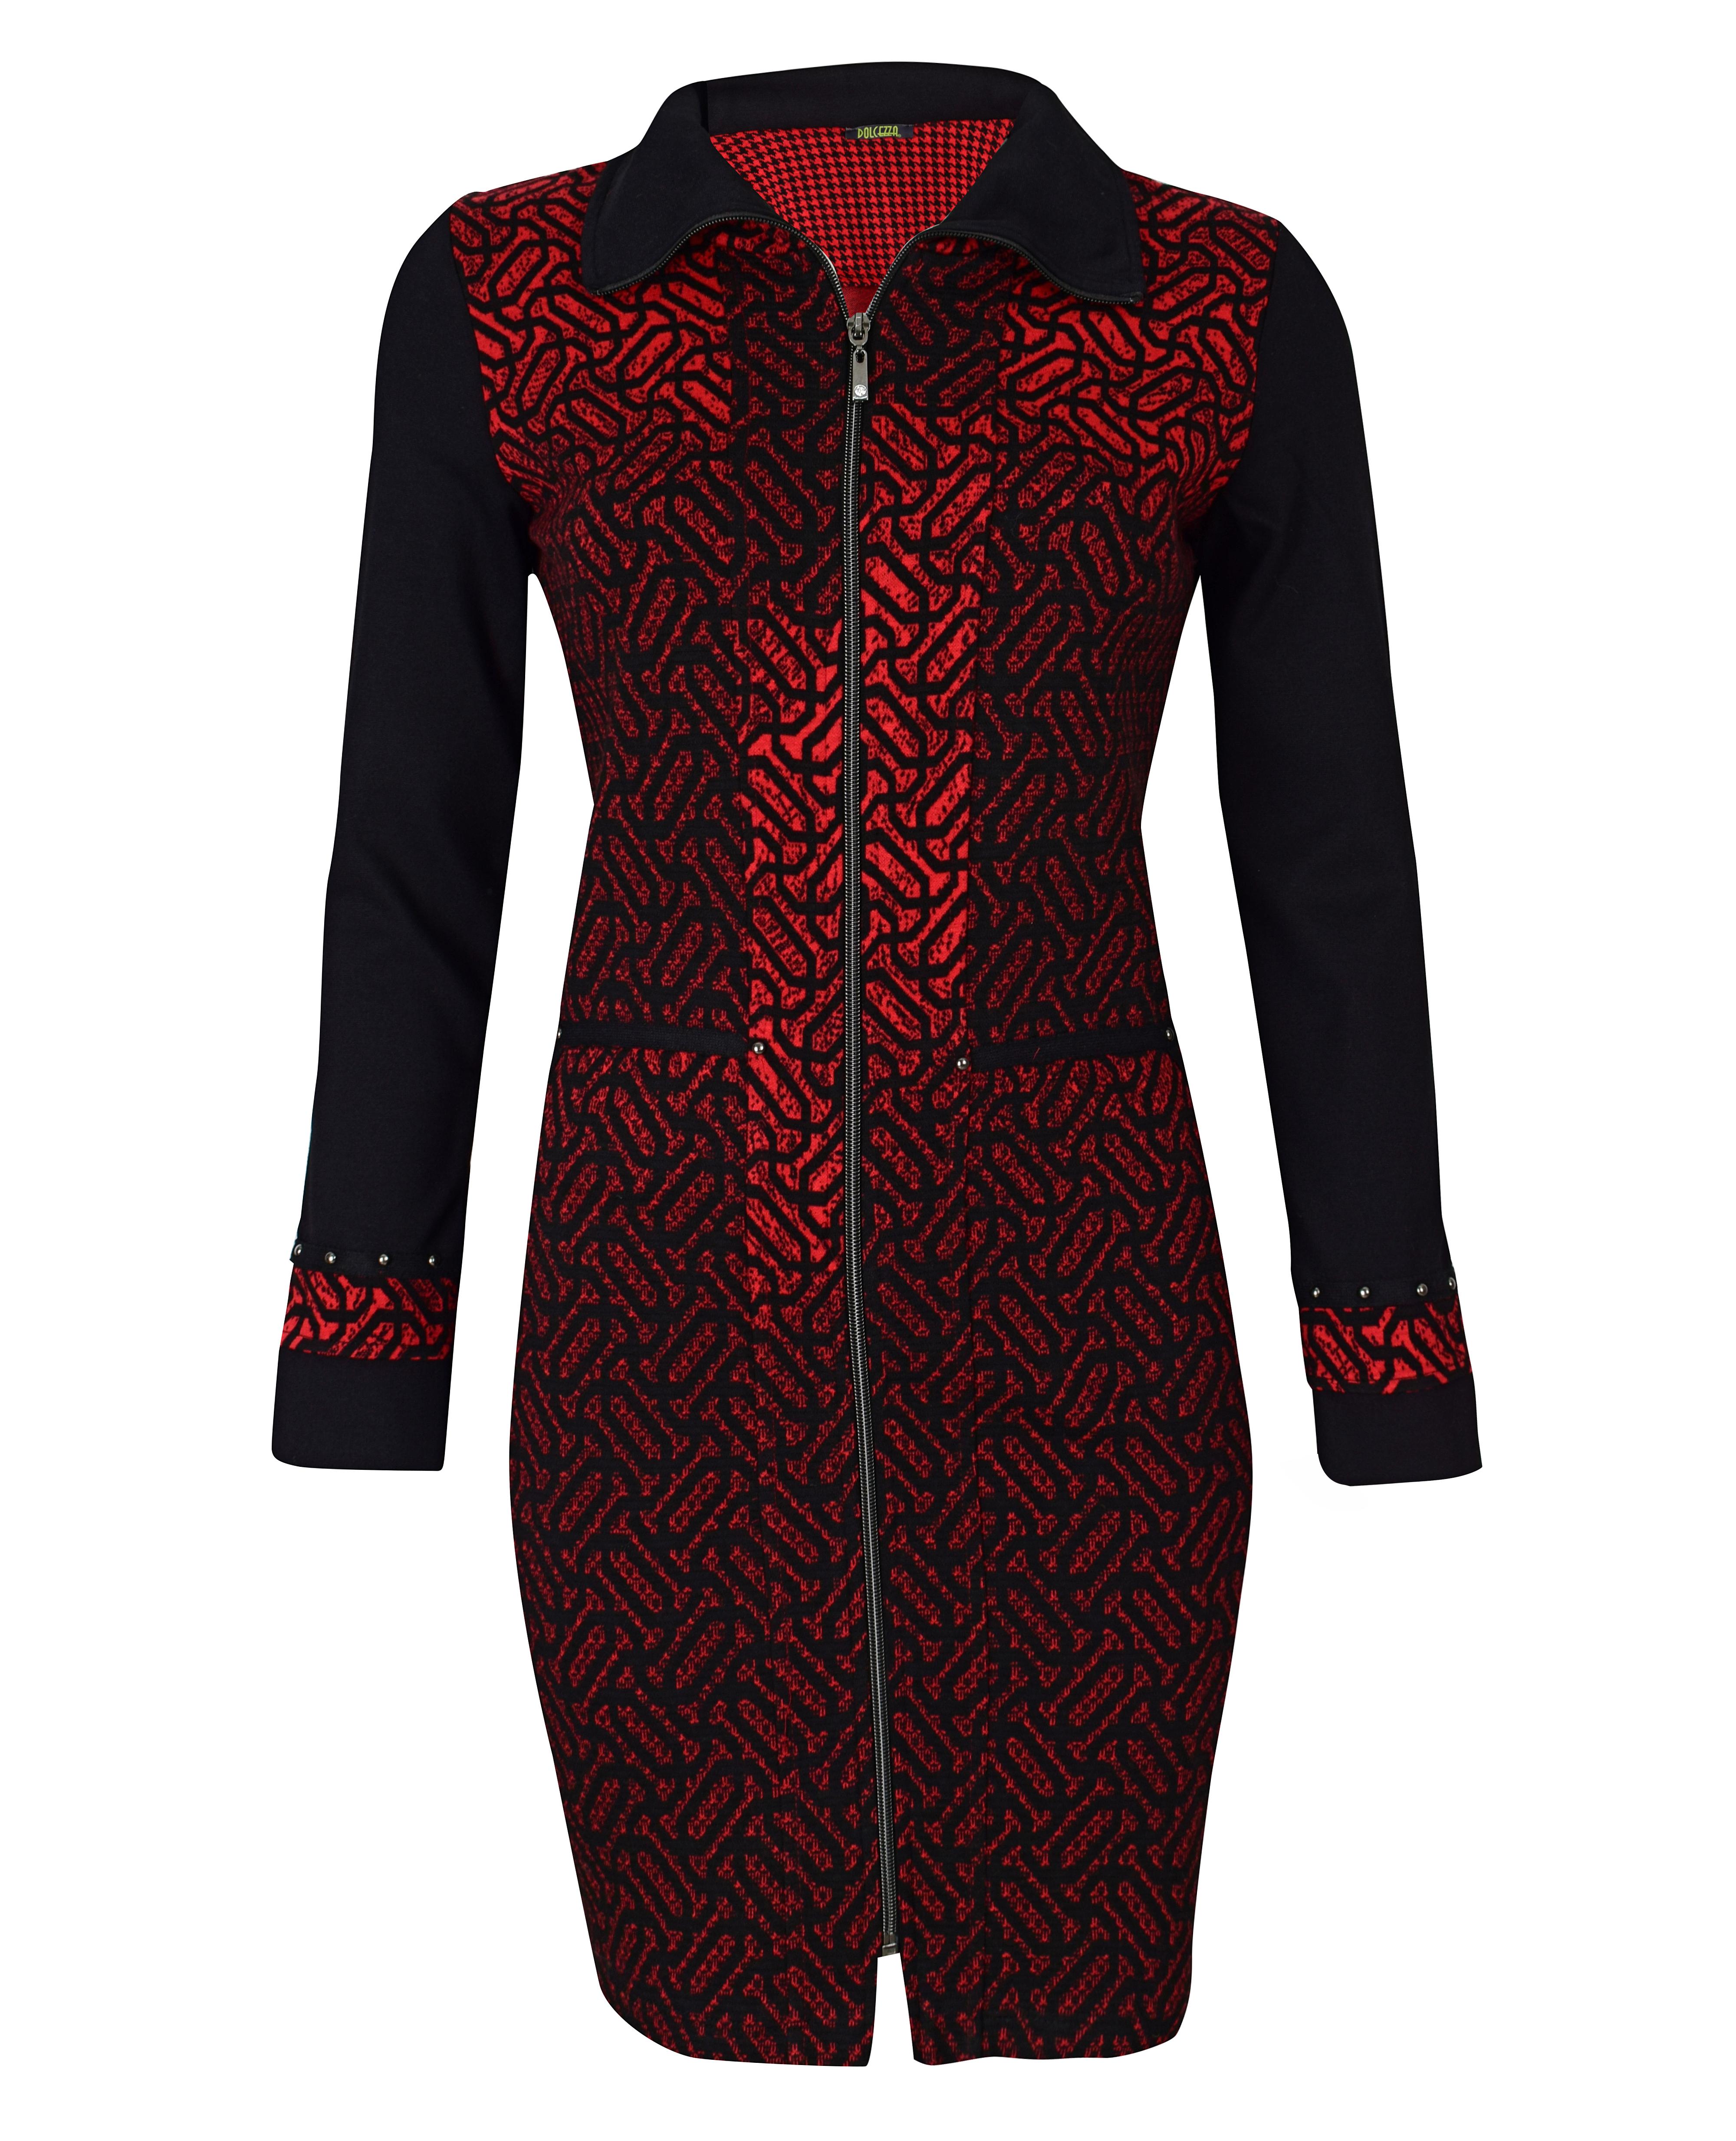 Dolcezza: Dance The Tango Zip Midi Dress (1 Left!) Dolcezza_59144_N